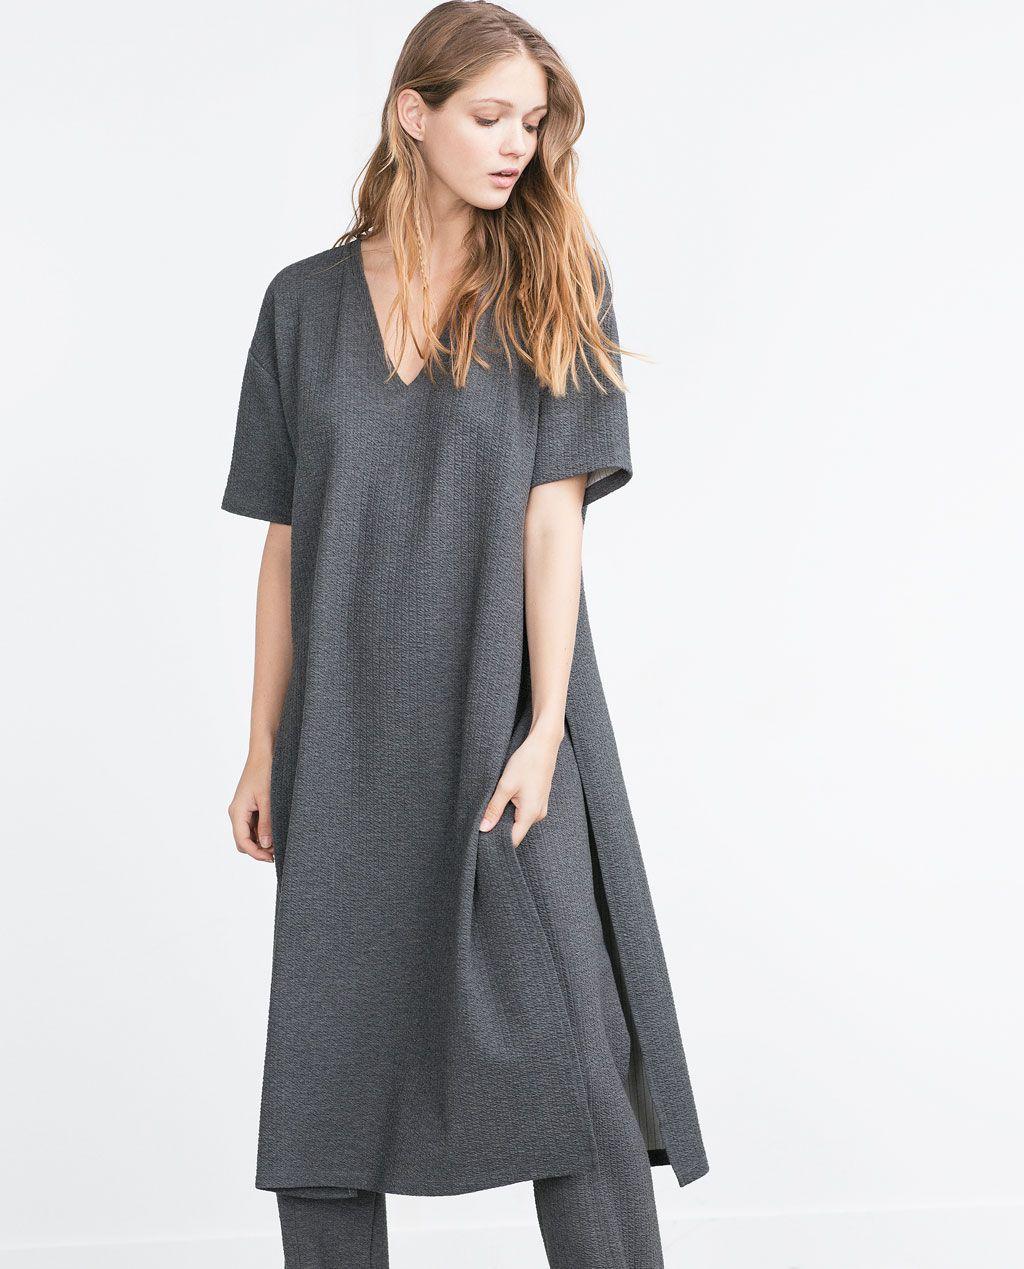 Image  of JACQUARD PATTERN TOP from Zara  Looks  Pinterest  Woman